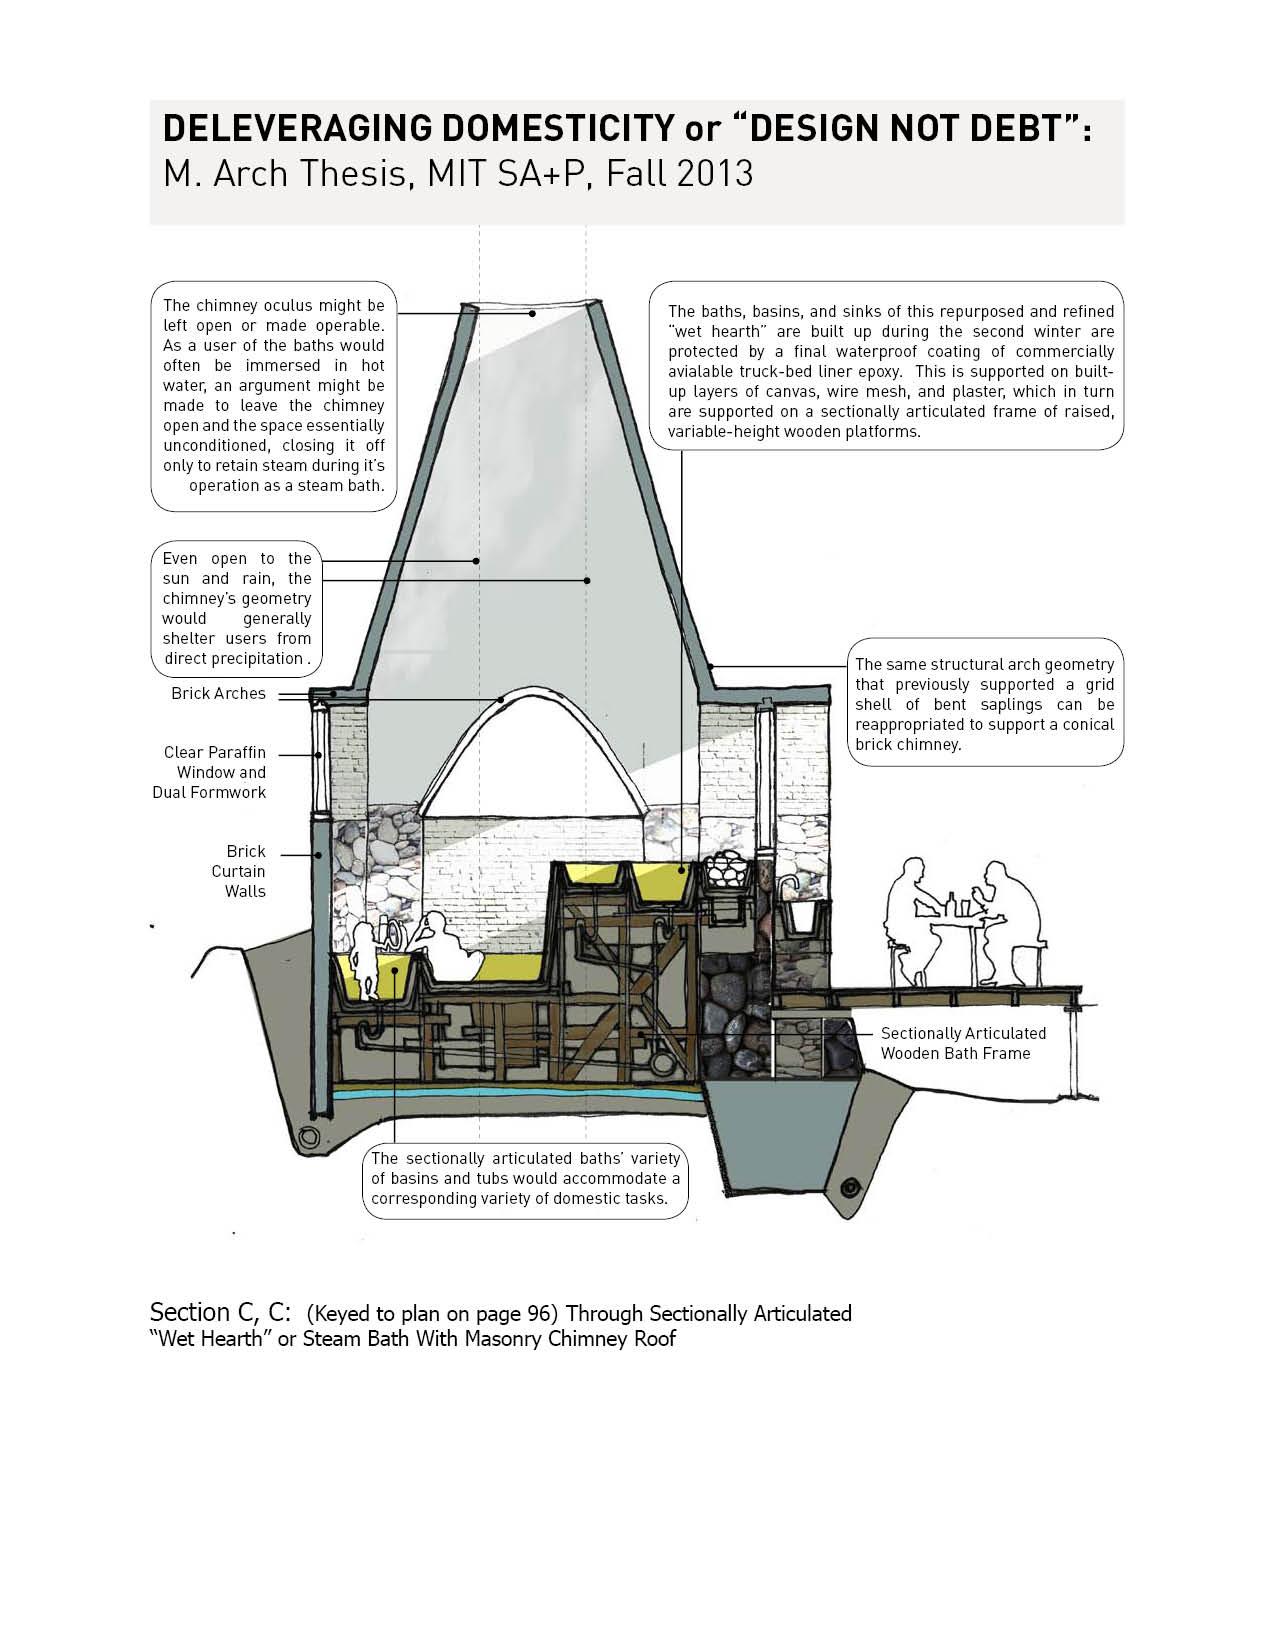 MIT_thesis44.jpg